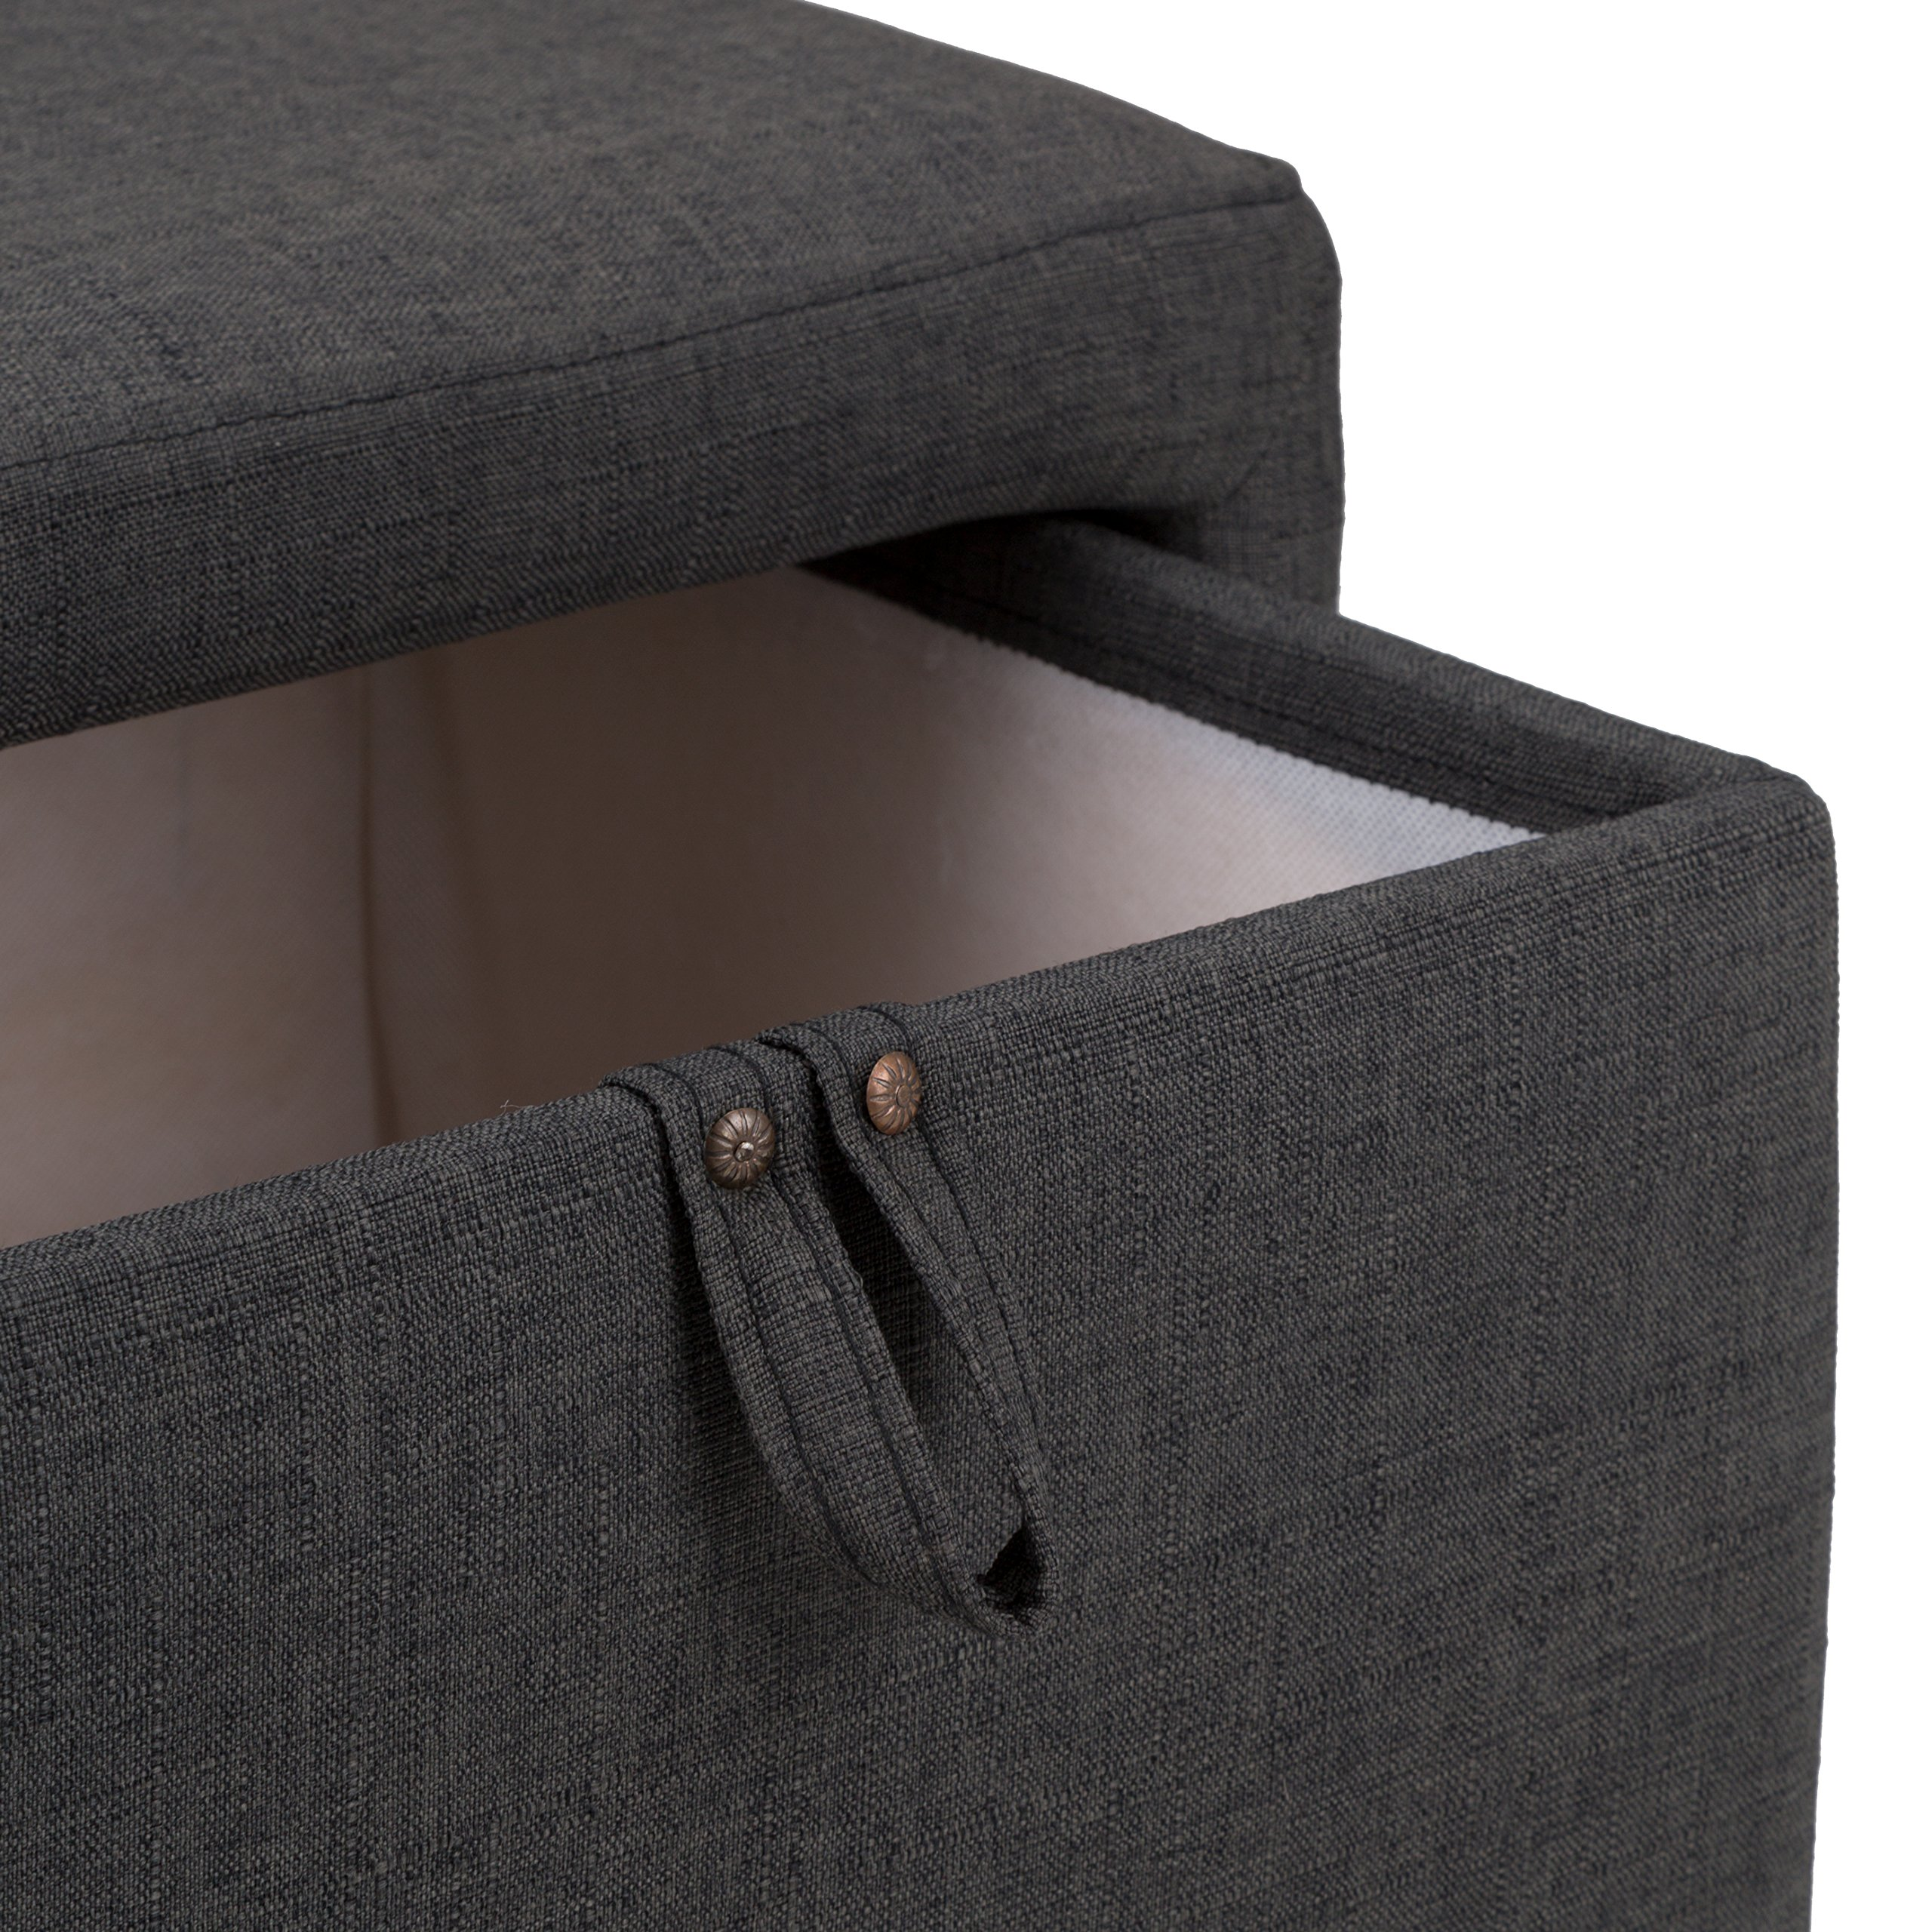 Fat Catalog Cube Storage Stool w/Drawer, Gray, ALT-OUG1001-SO by Fat Catalog (Image #8)